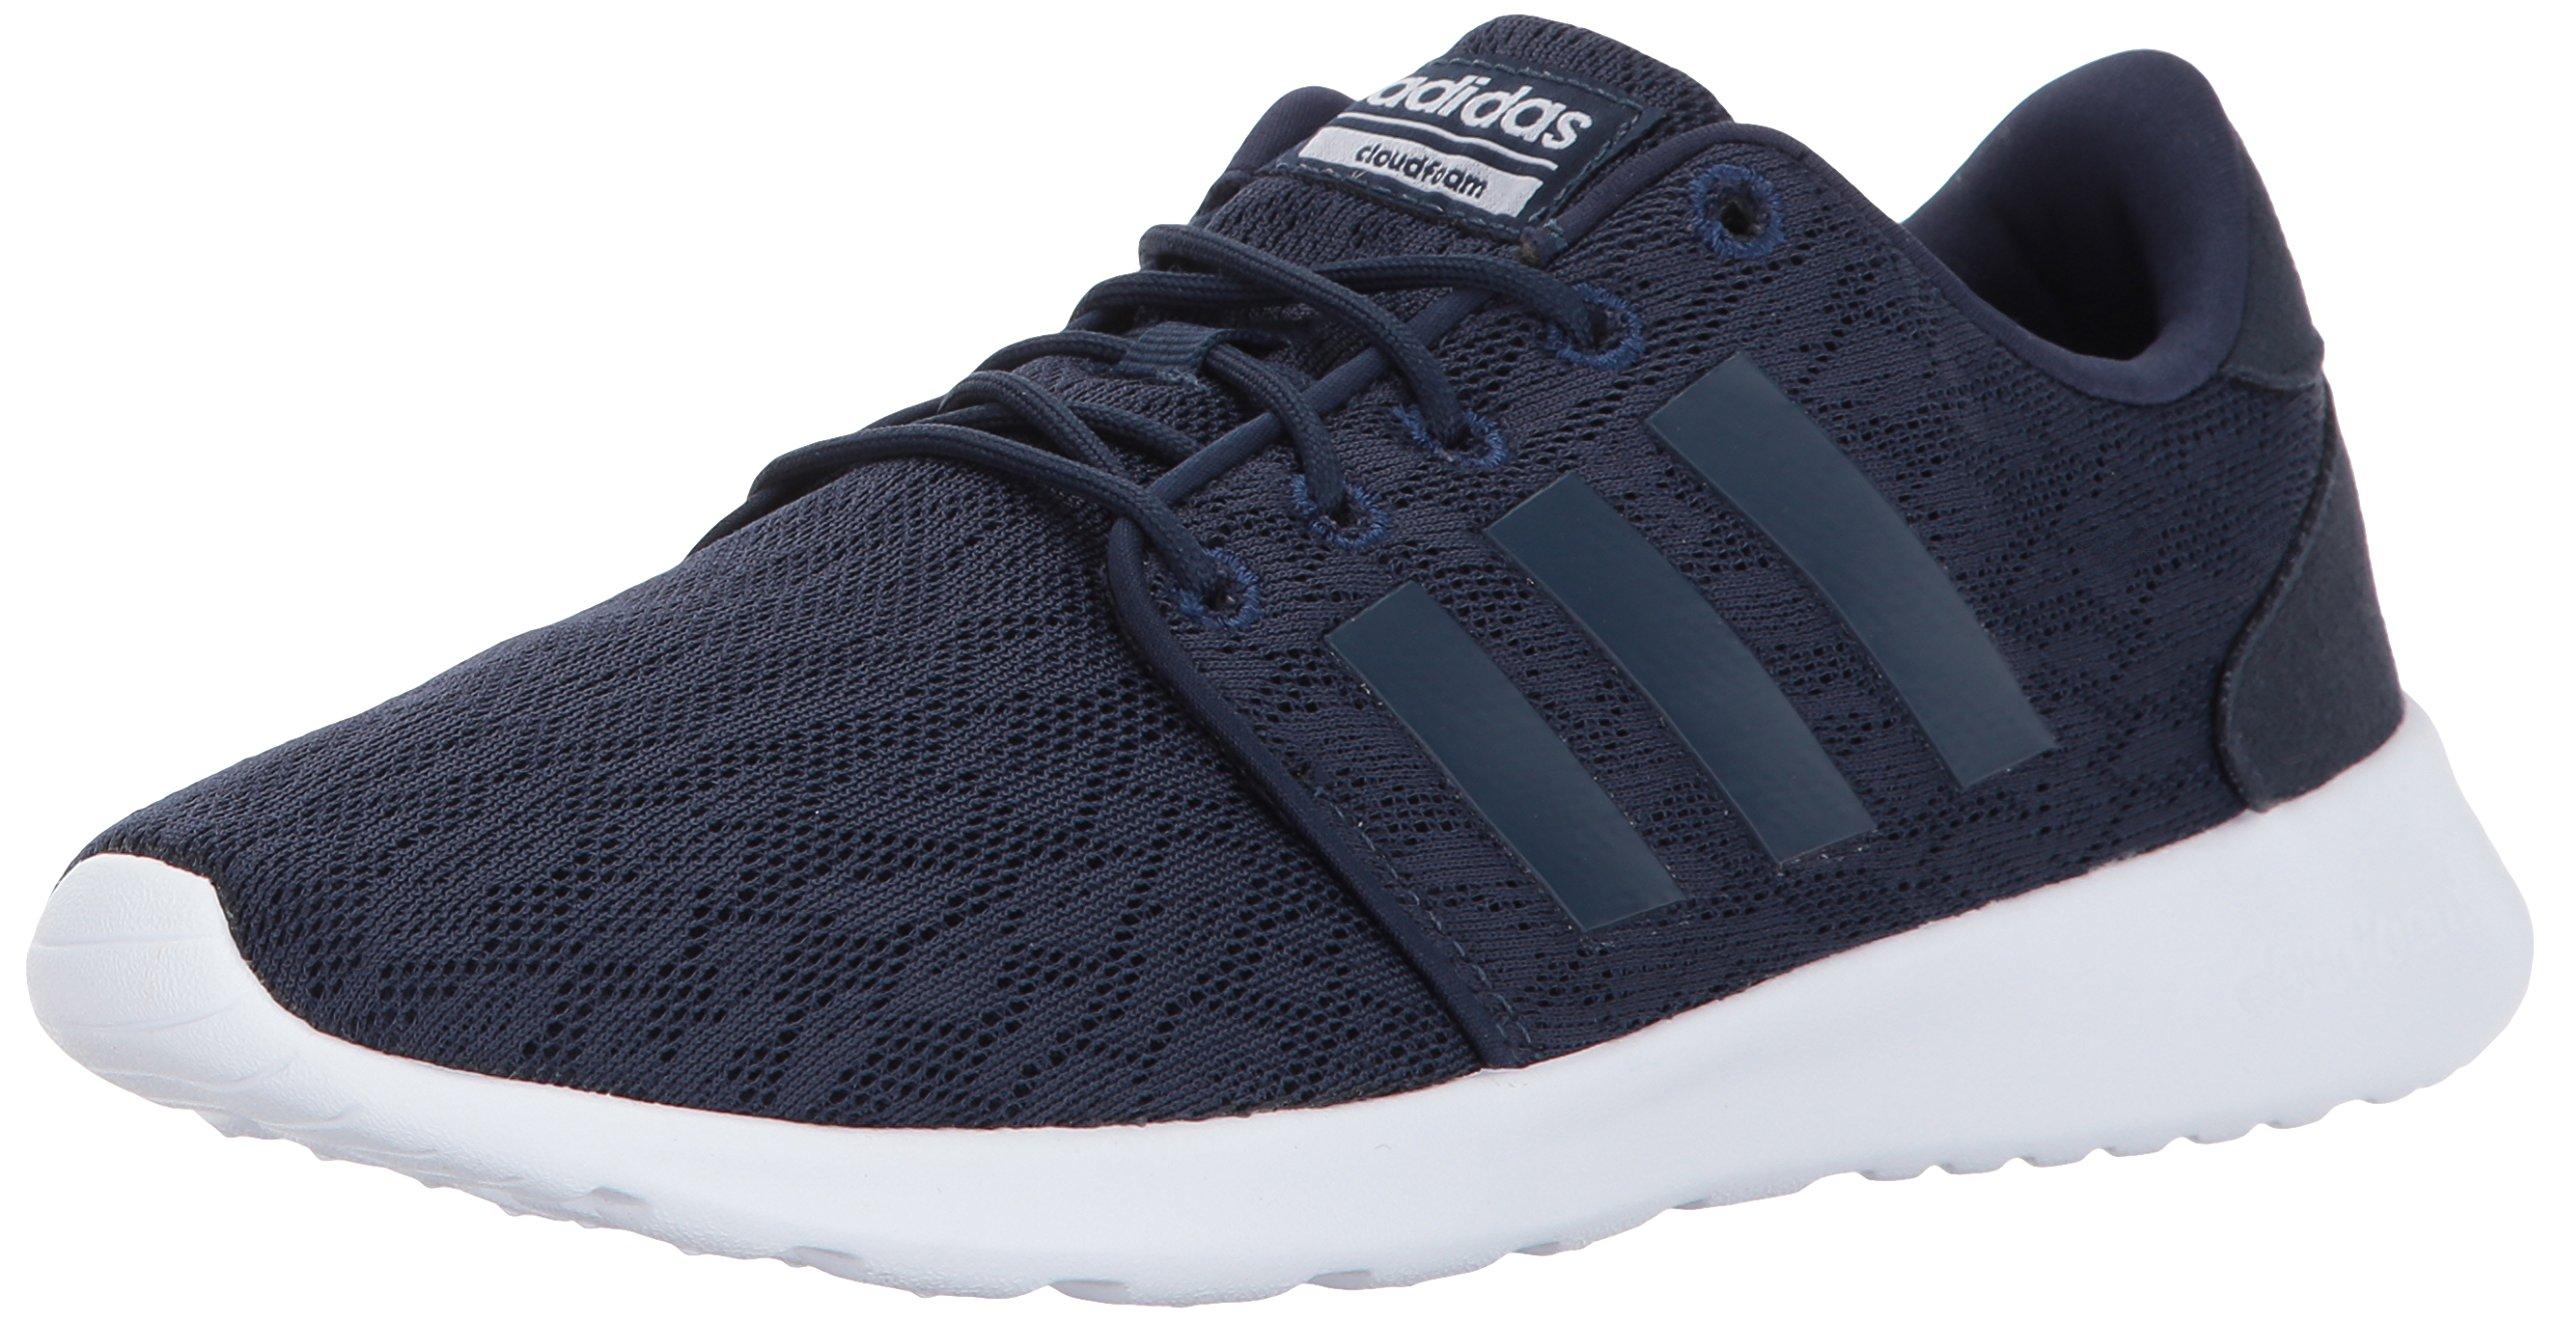 adidas Women's CF QT Racer Running Shoes, Collegiate Navy/Collegiate Navy/White, (7 M US)